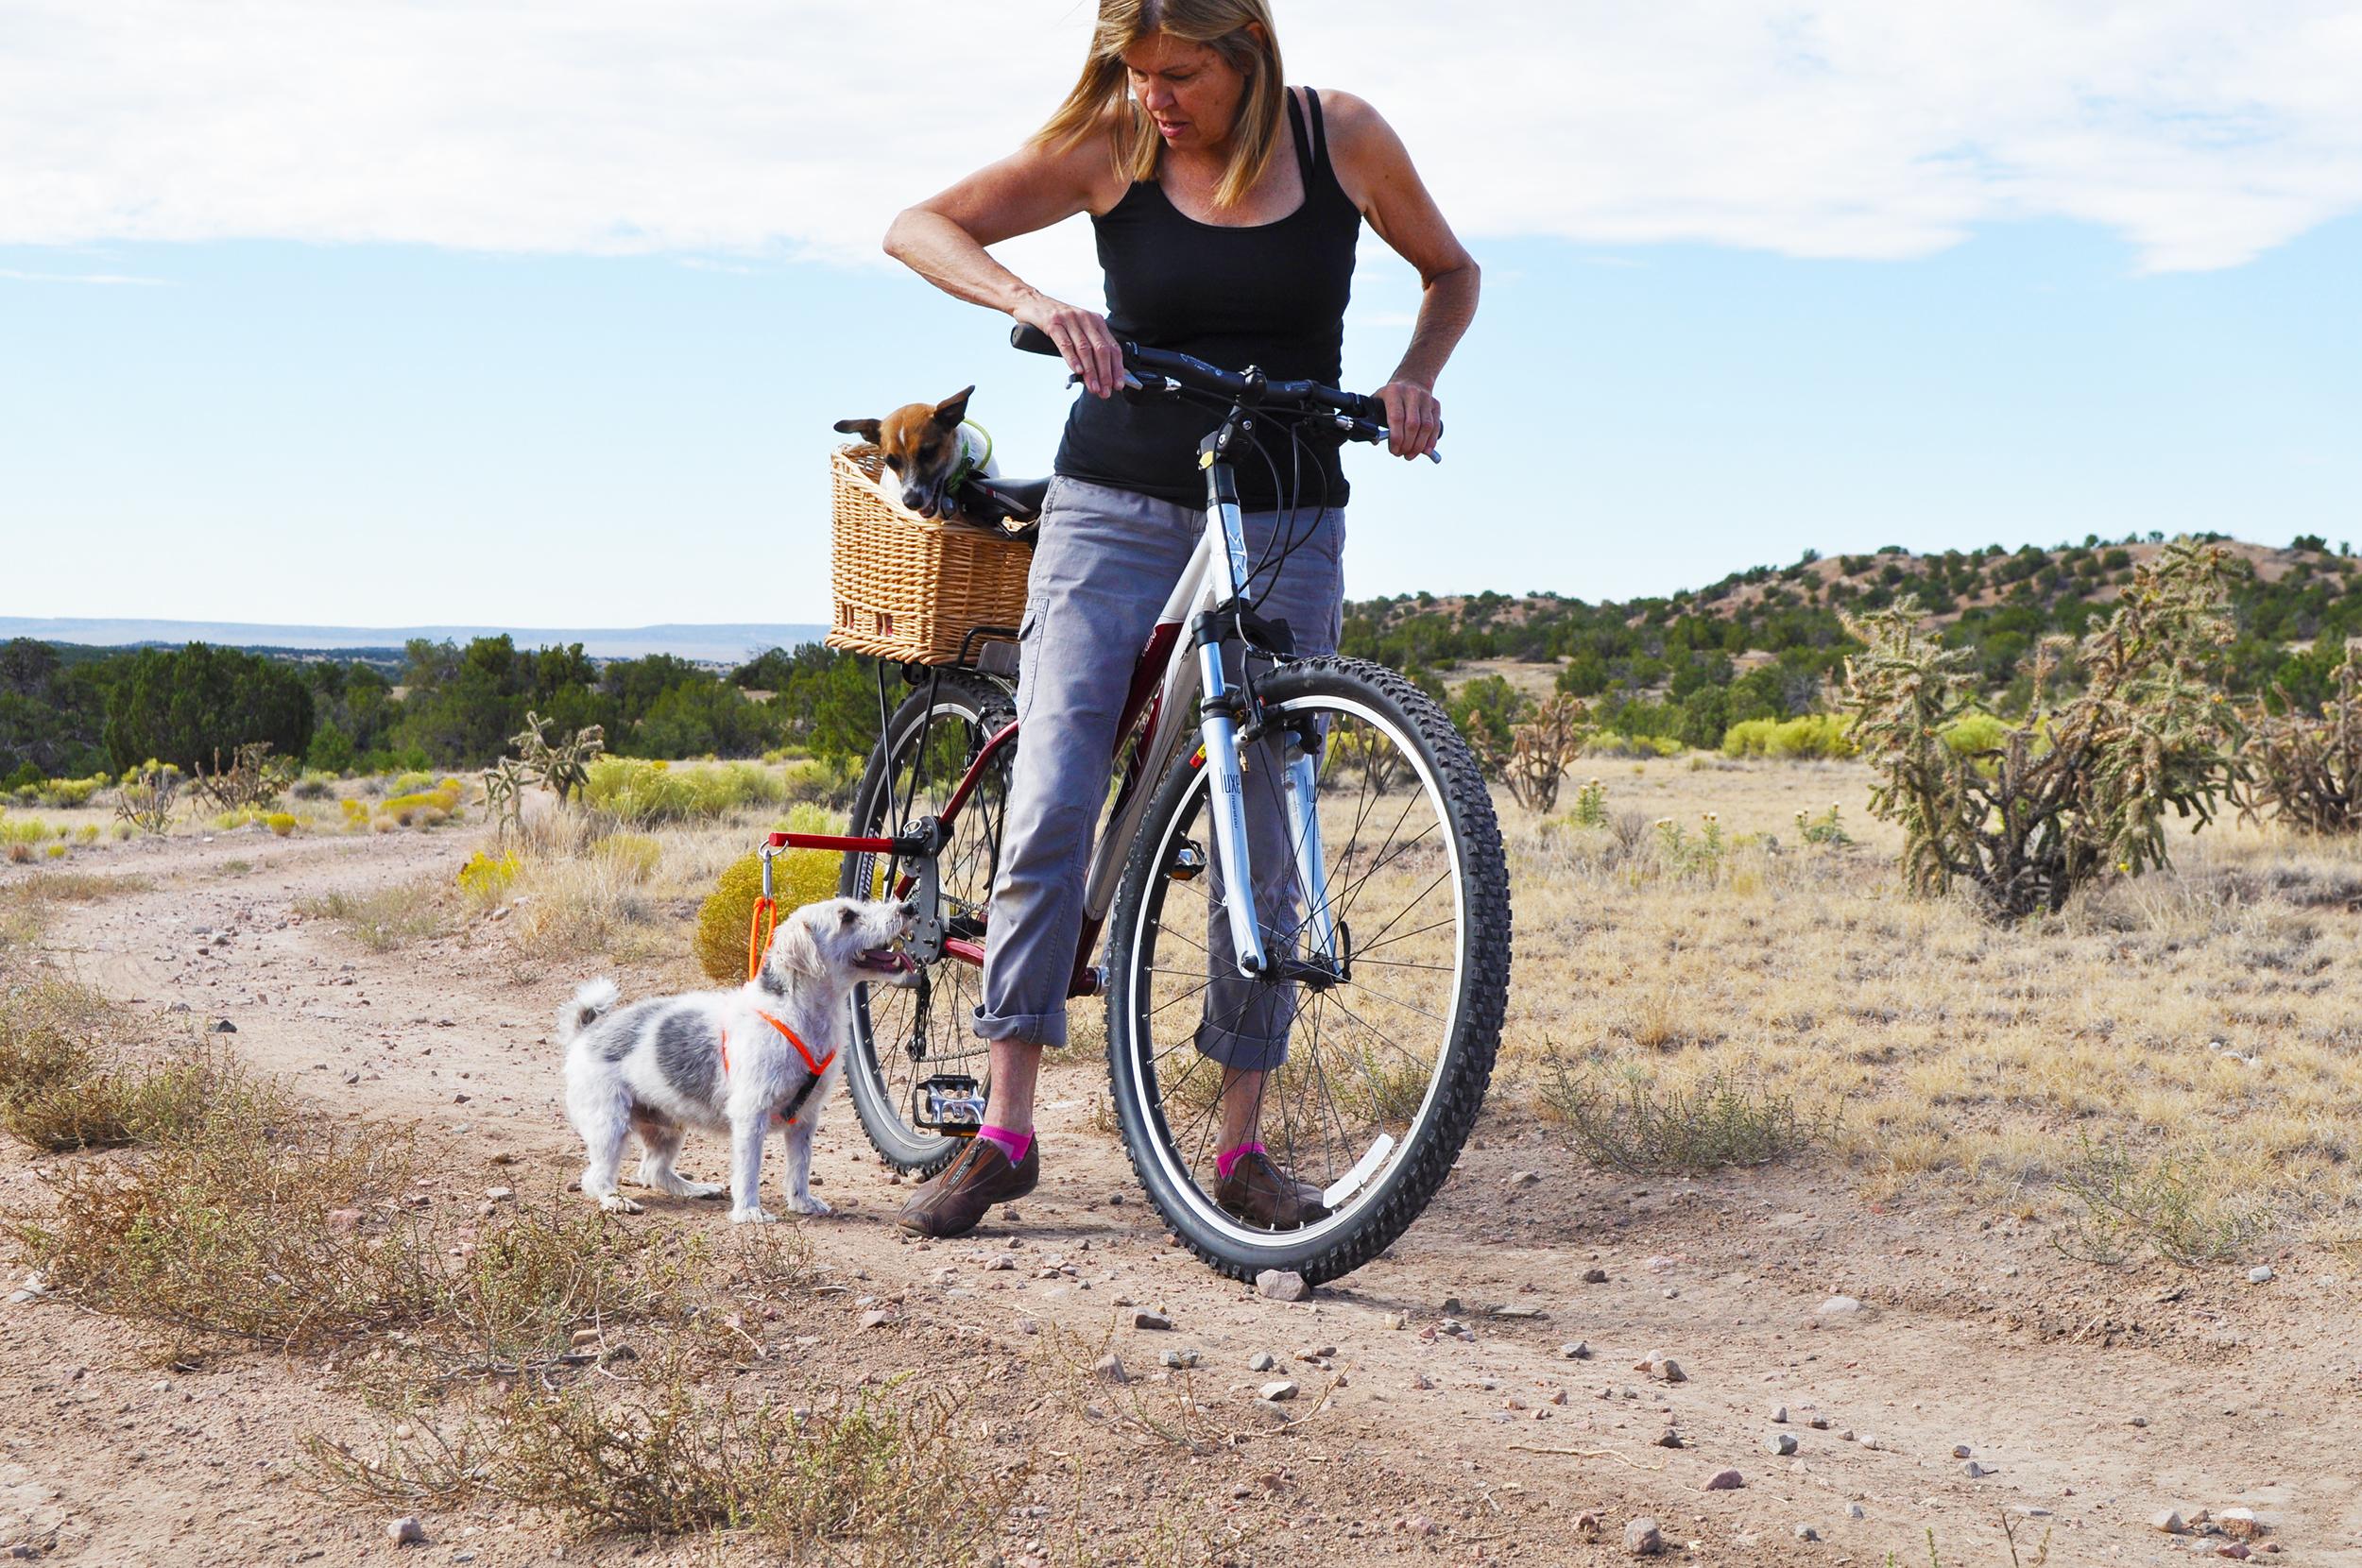 bikerdog.jpg